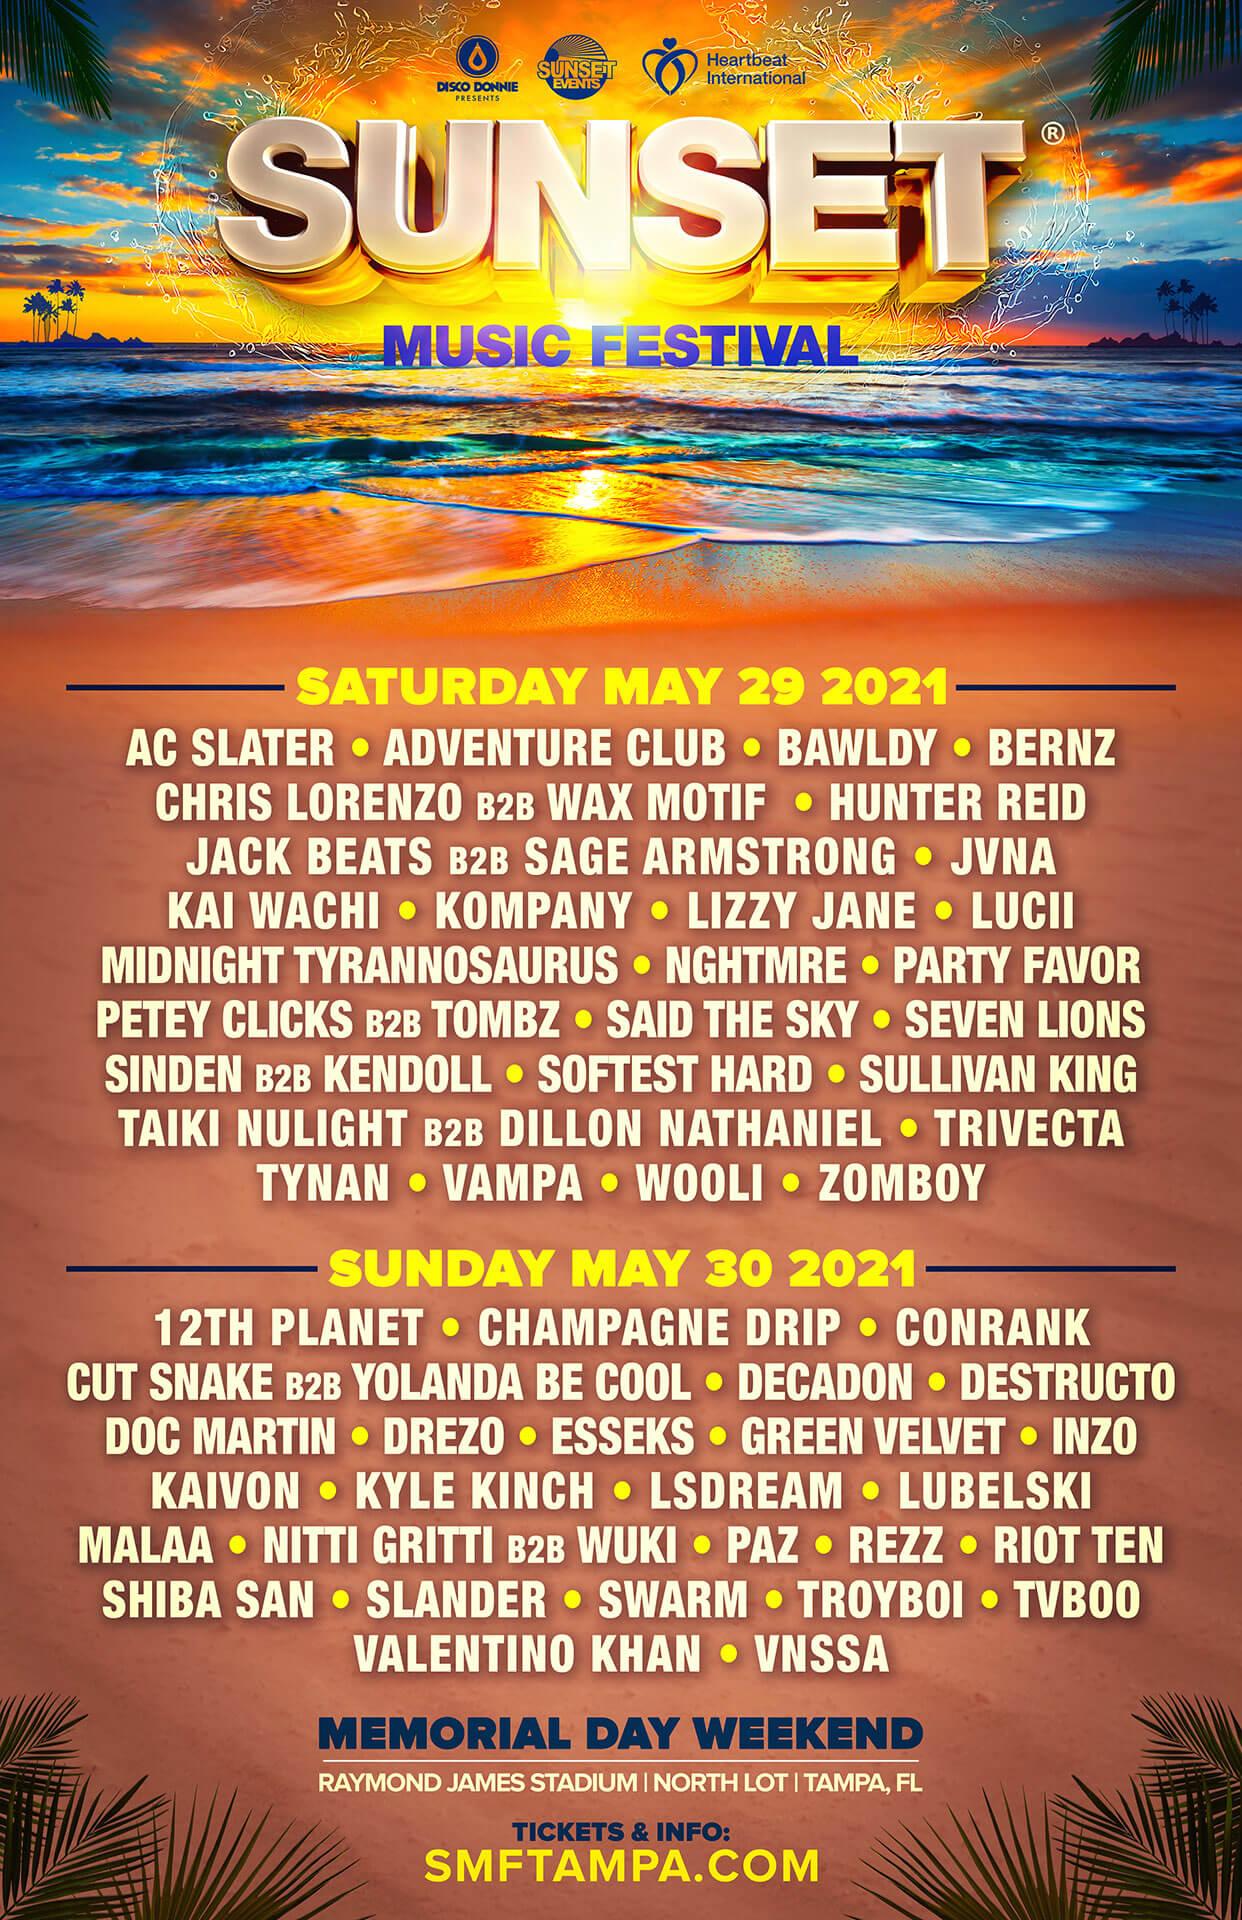 Sunset Music Festival 2021 Lineup